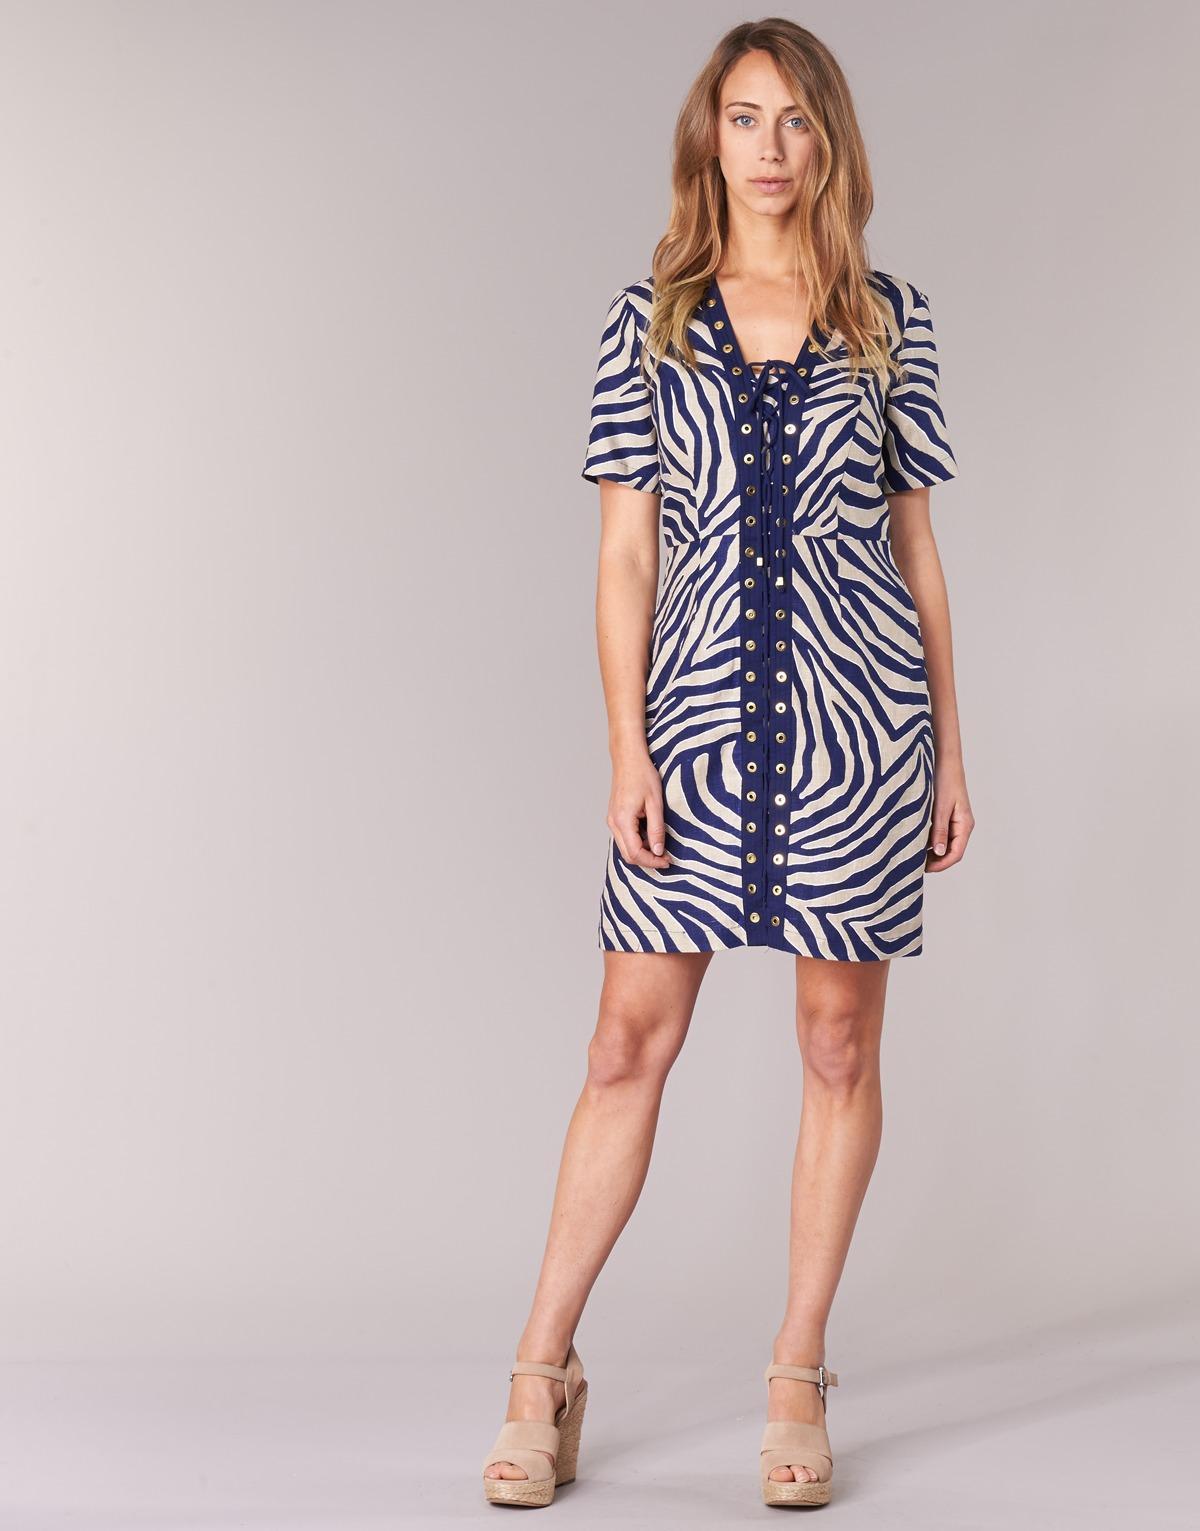 7c473f98d6 MICHAEL Michael Kors Quincy Summer Dress in Blue - Save 1% - Lyst